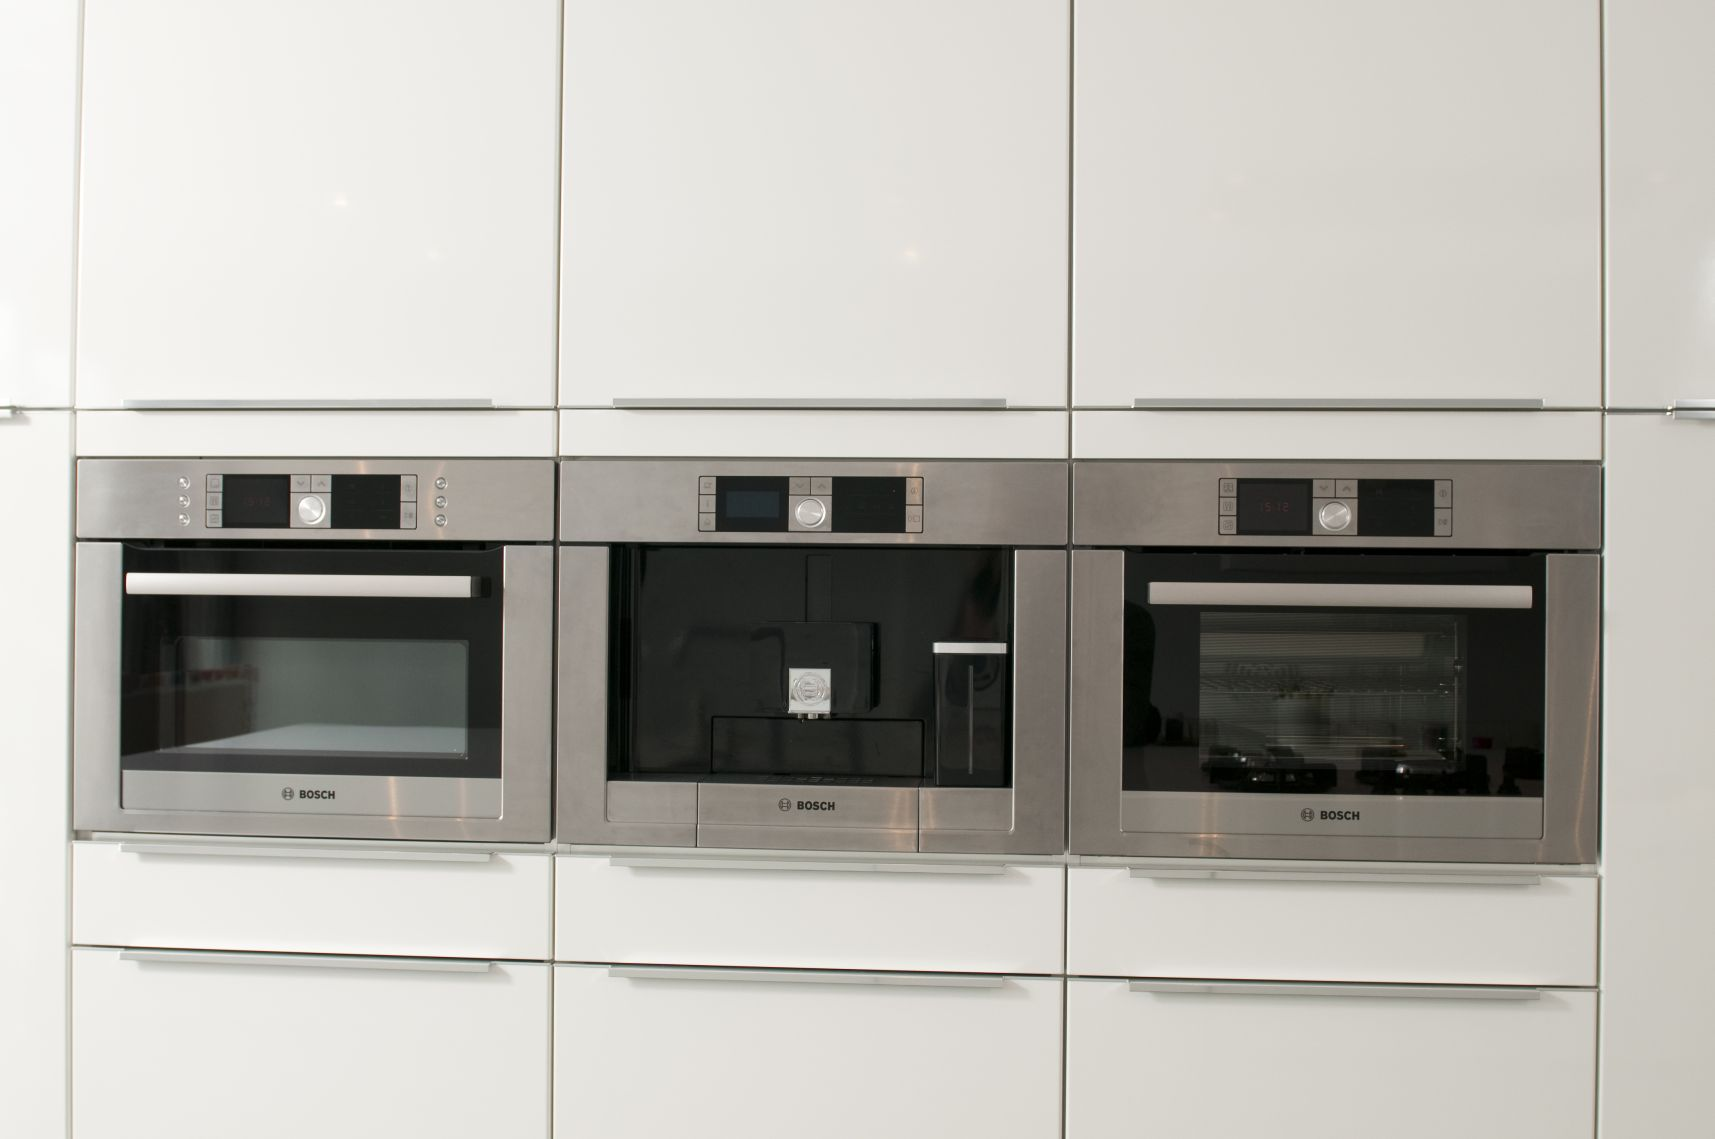 H cker systemat 4030 hoogglans wit in friesland groningen for Bosch apparatuur